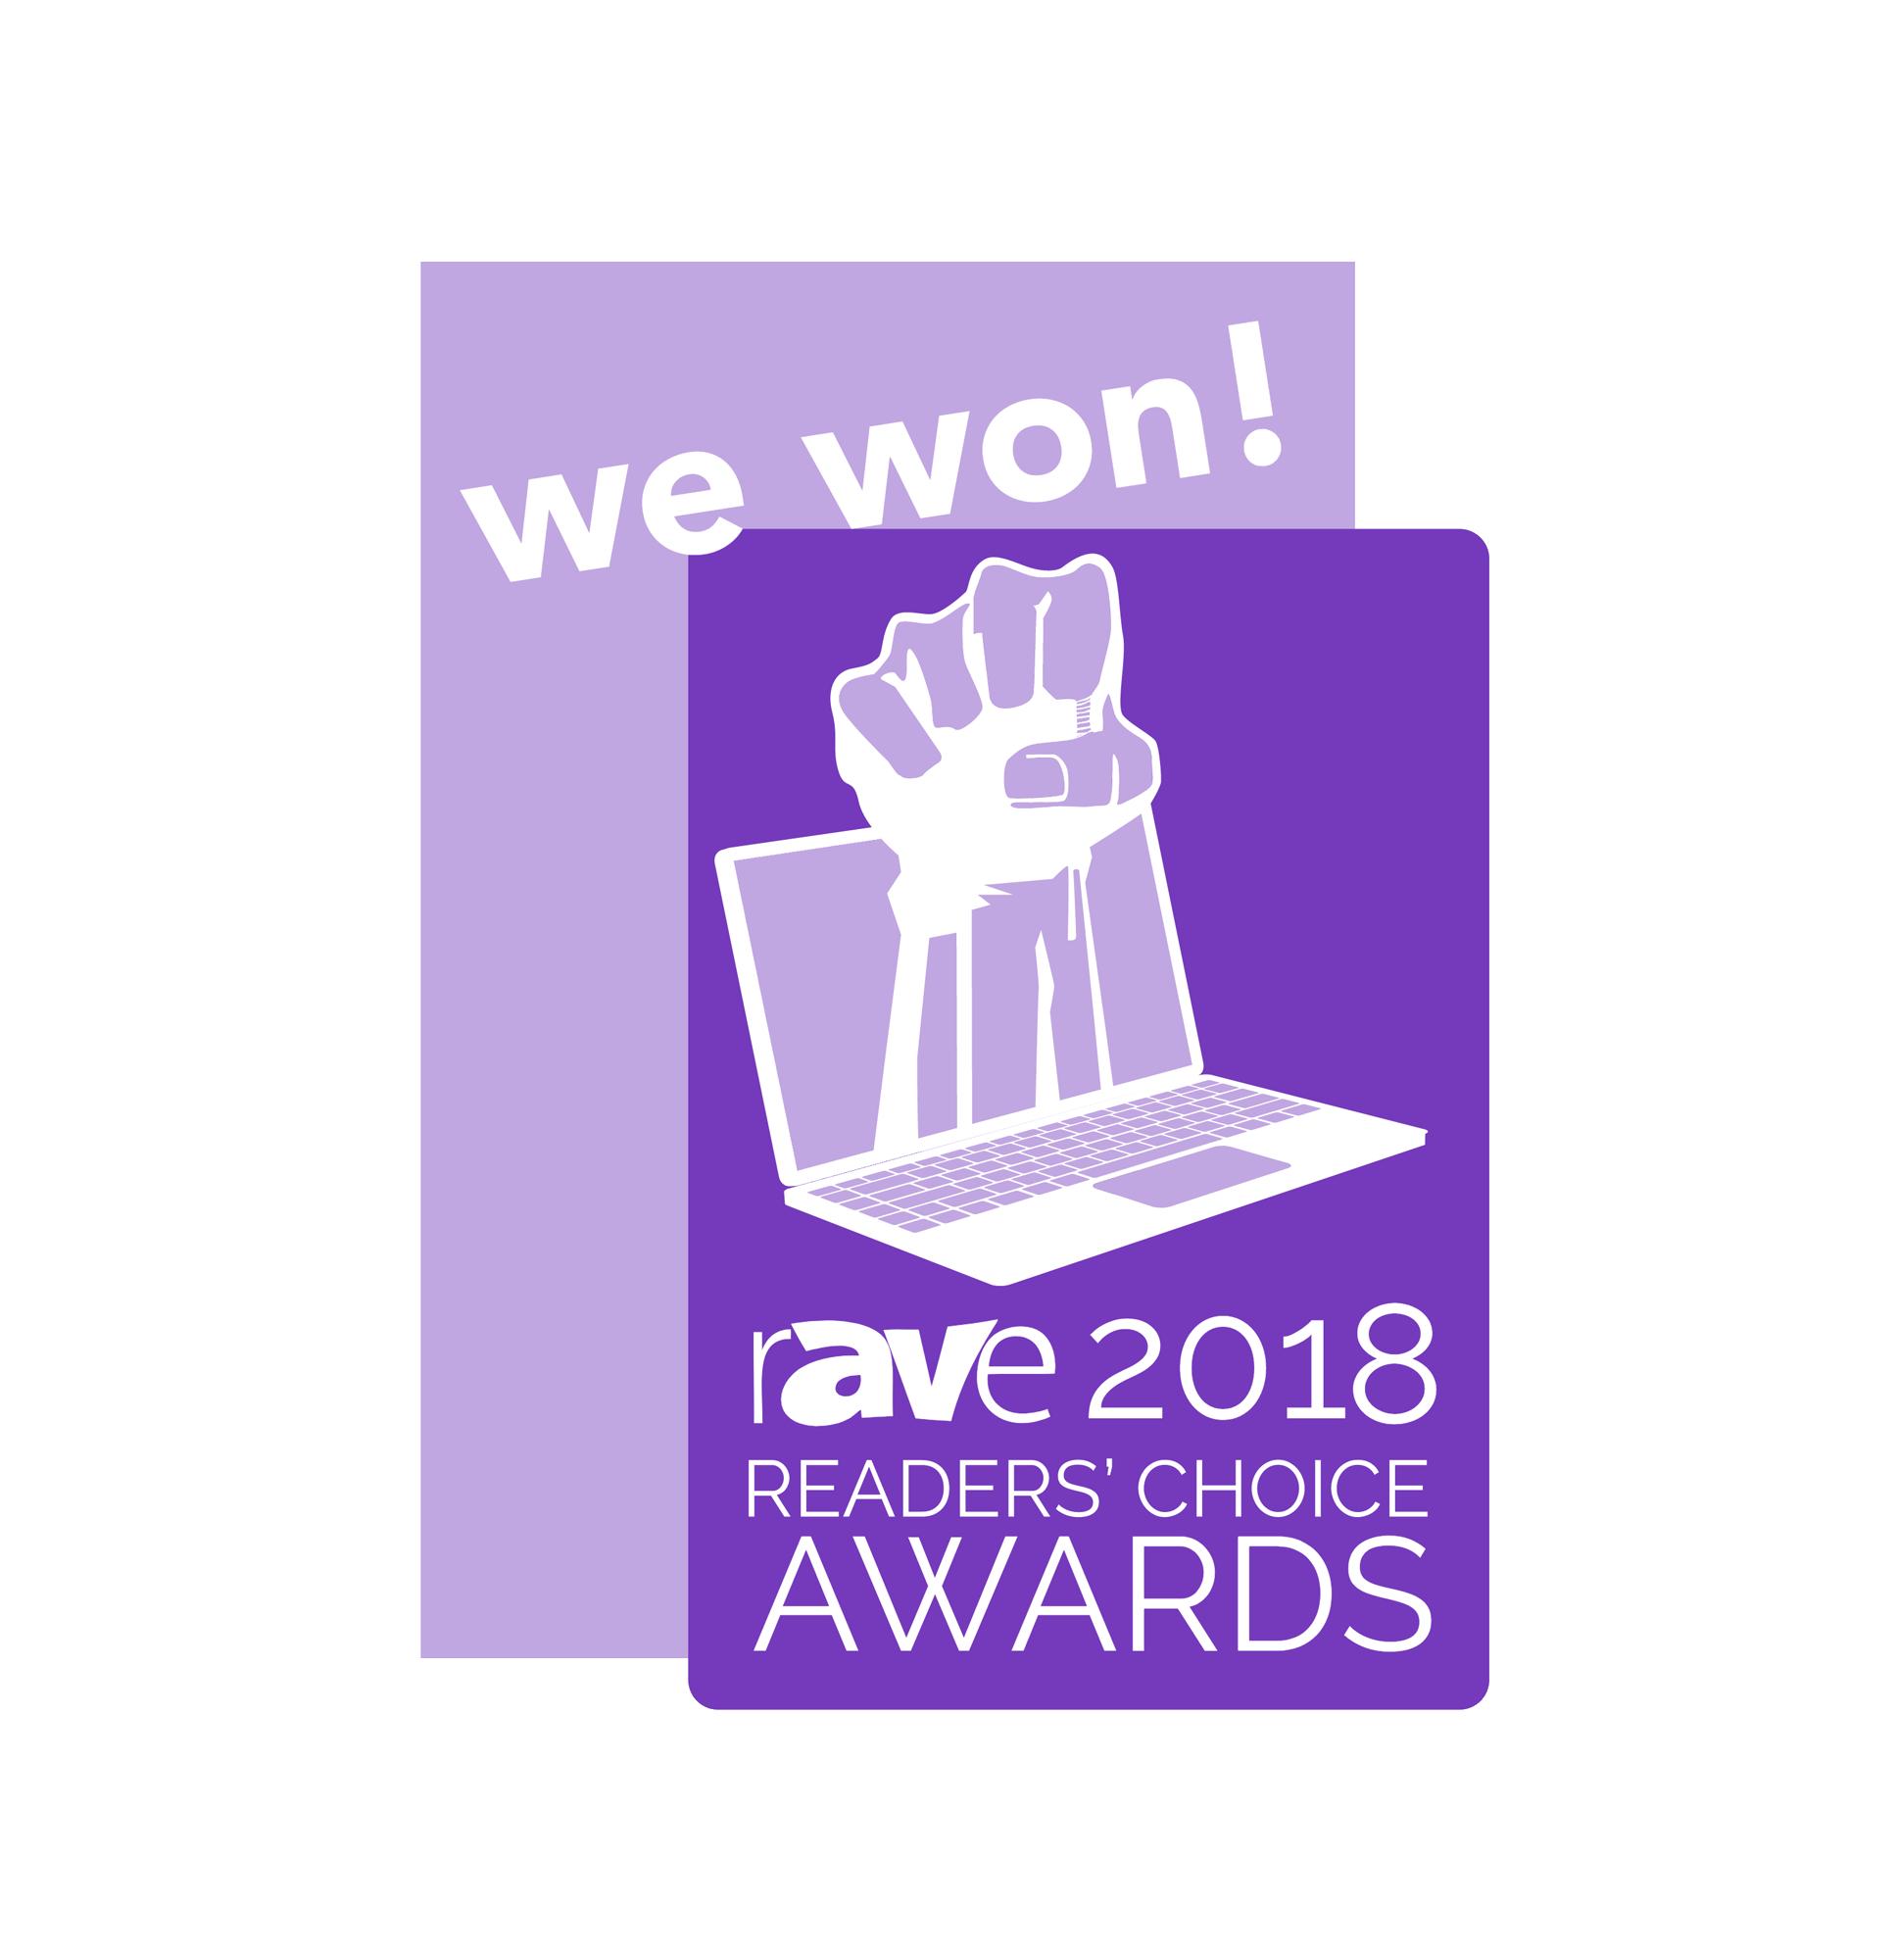 rAVE Reader's Choice Awards